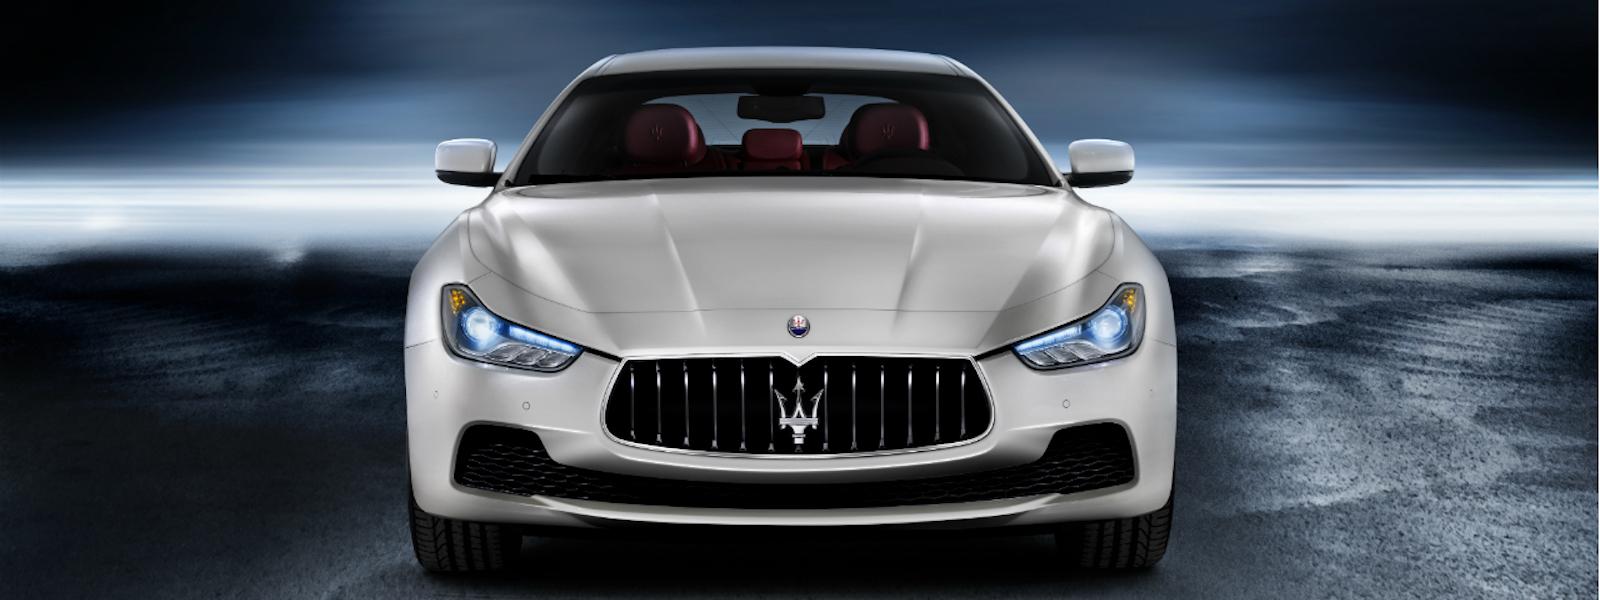 Maserati Ghibli Exterior